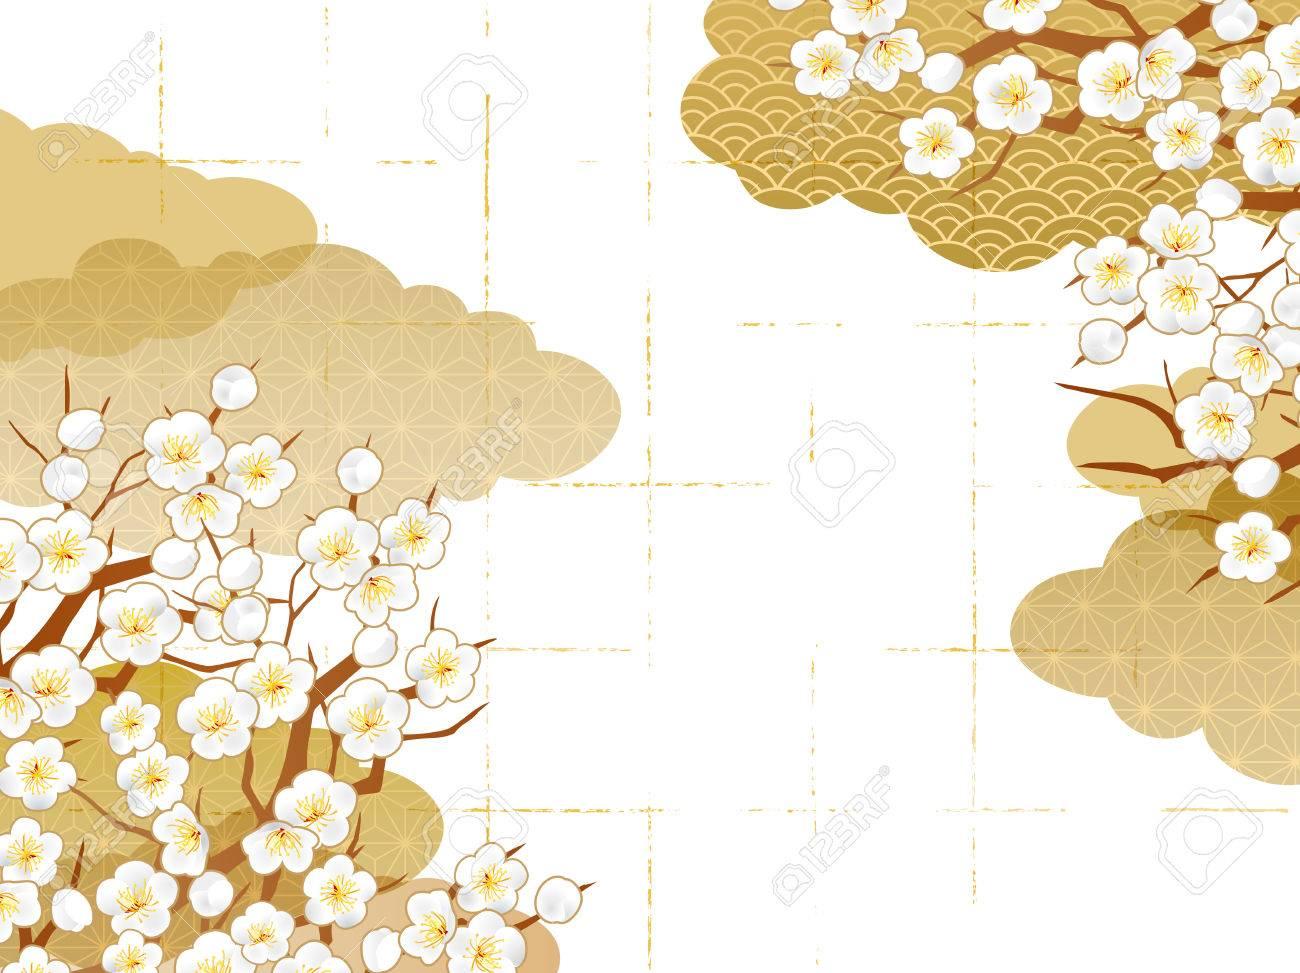 Japanese pattern background - 85480604